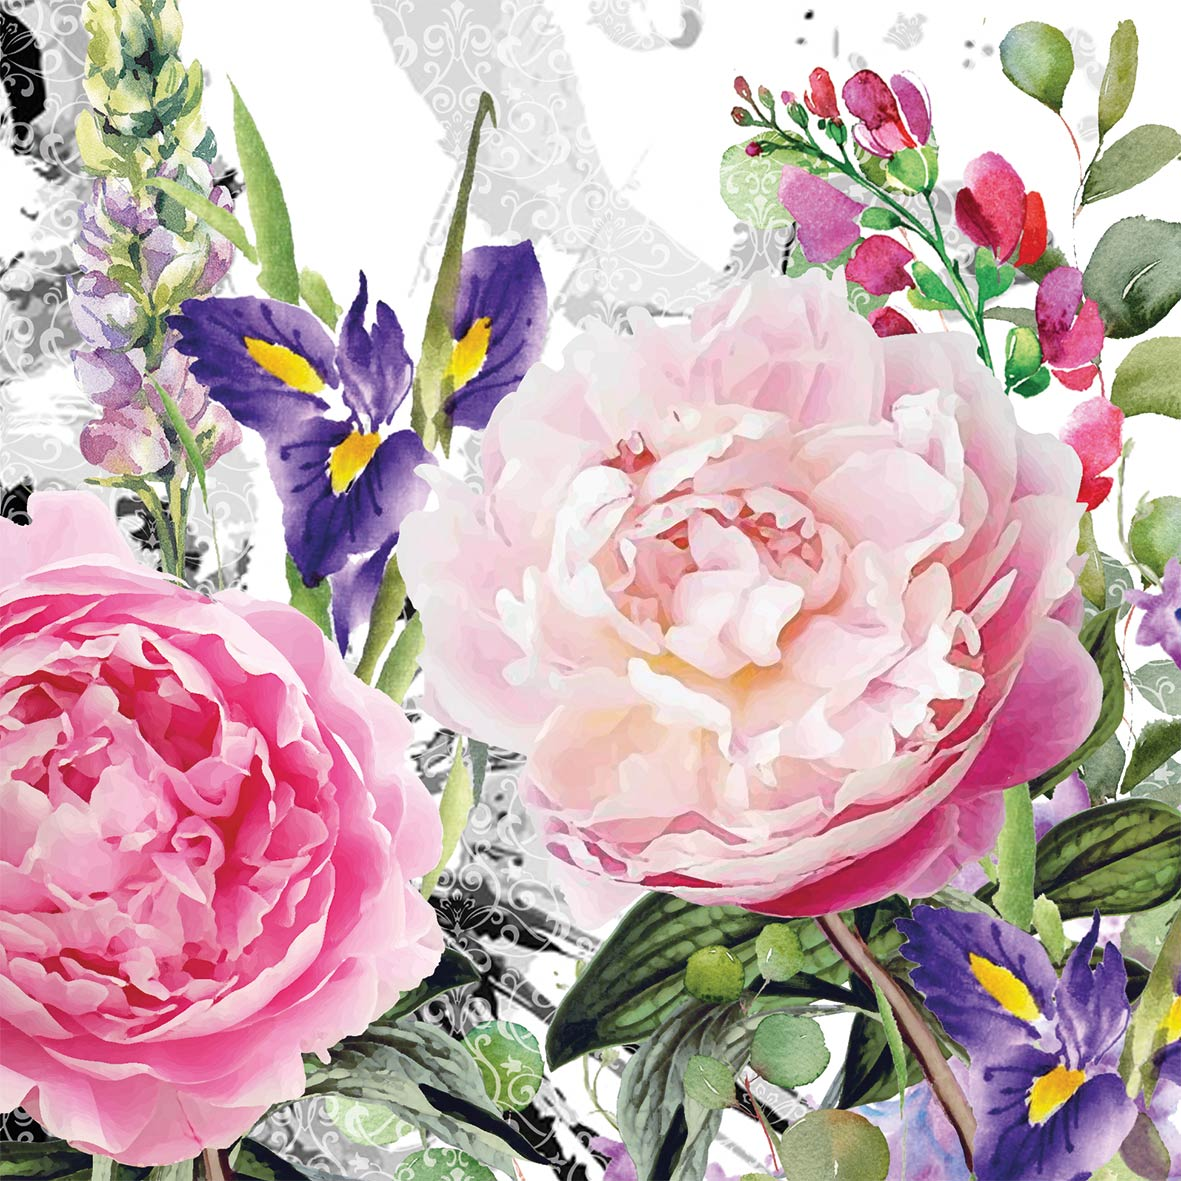 Jardin des roses Napkin 25x25